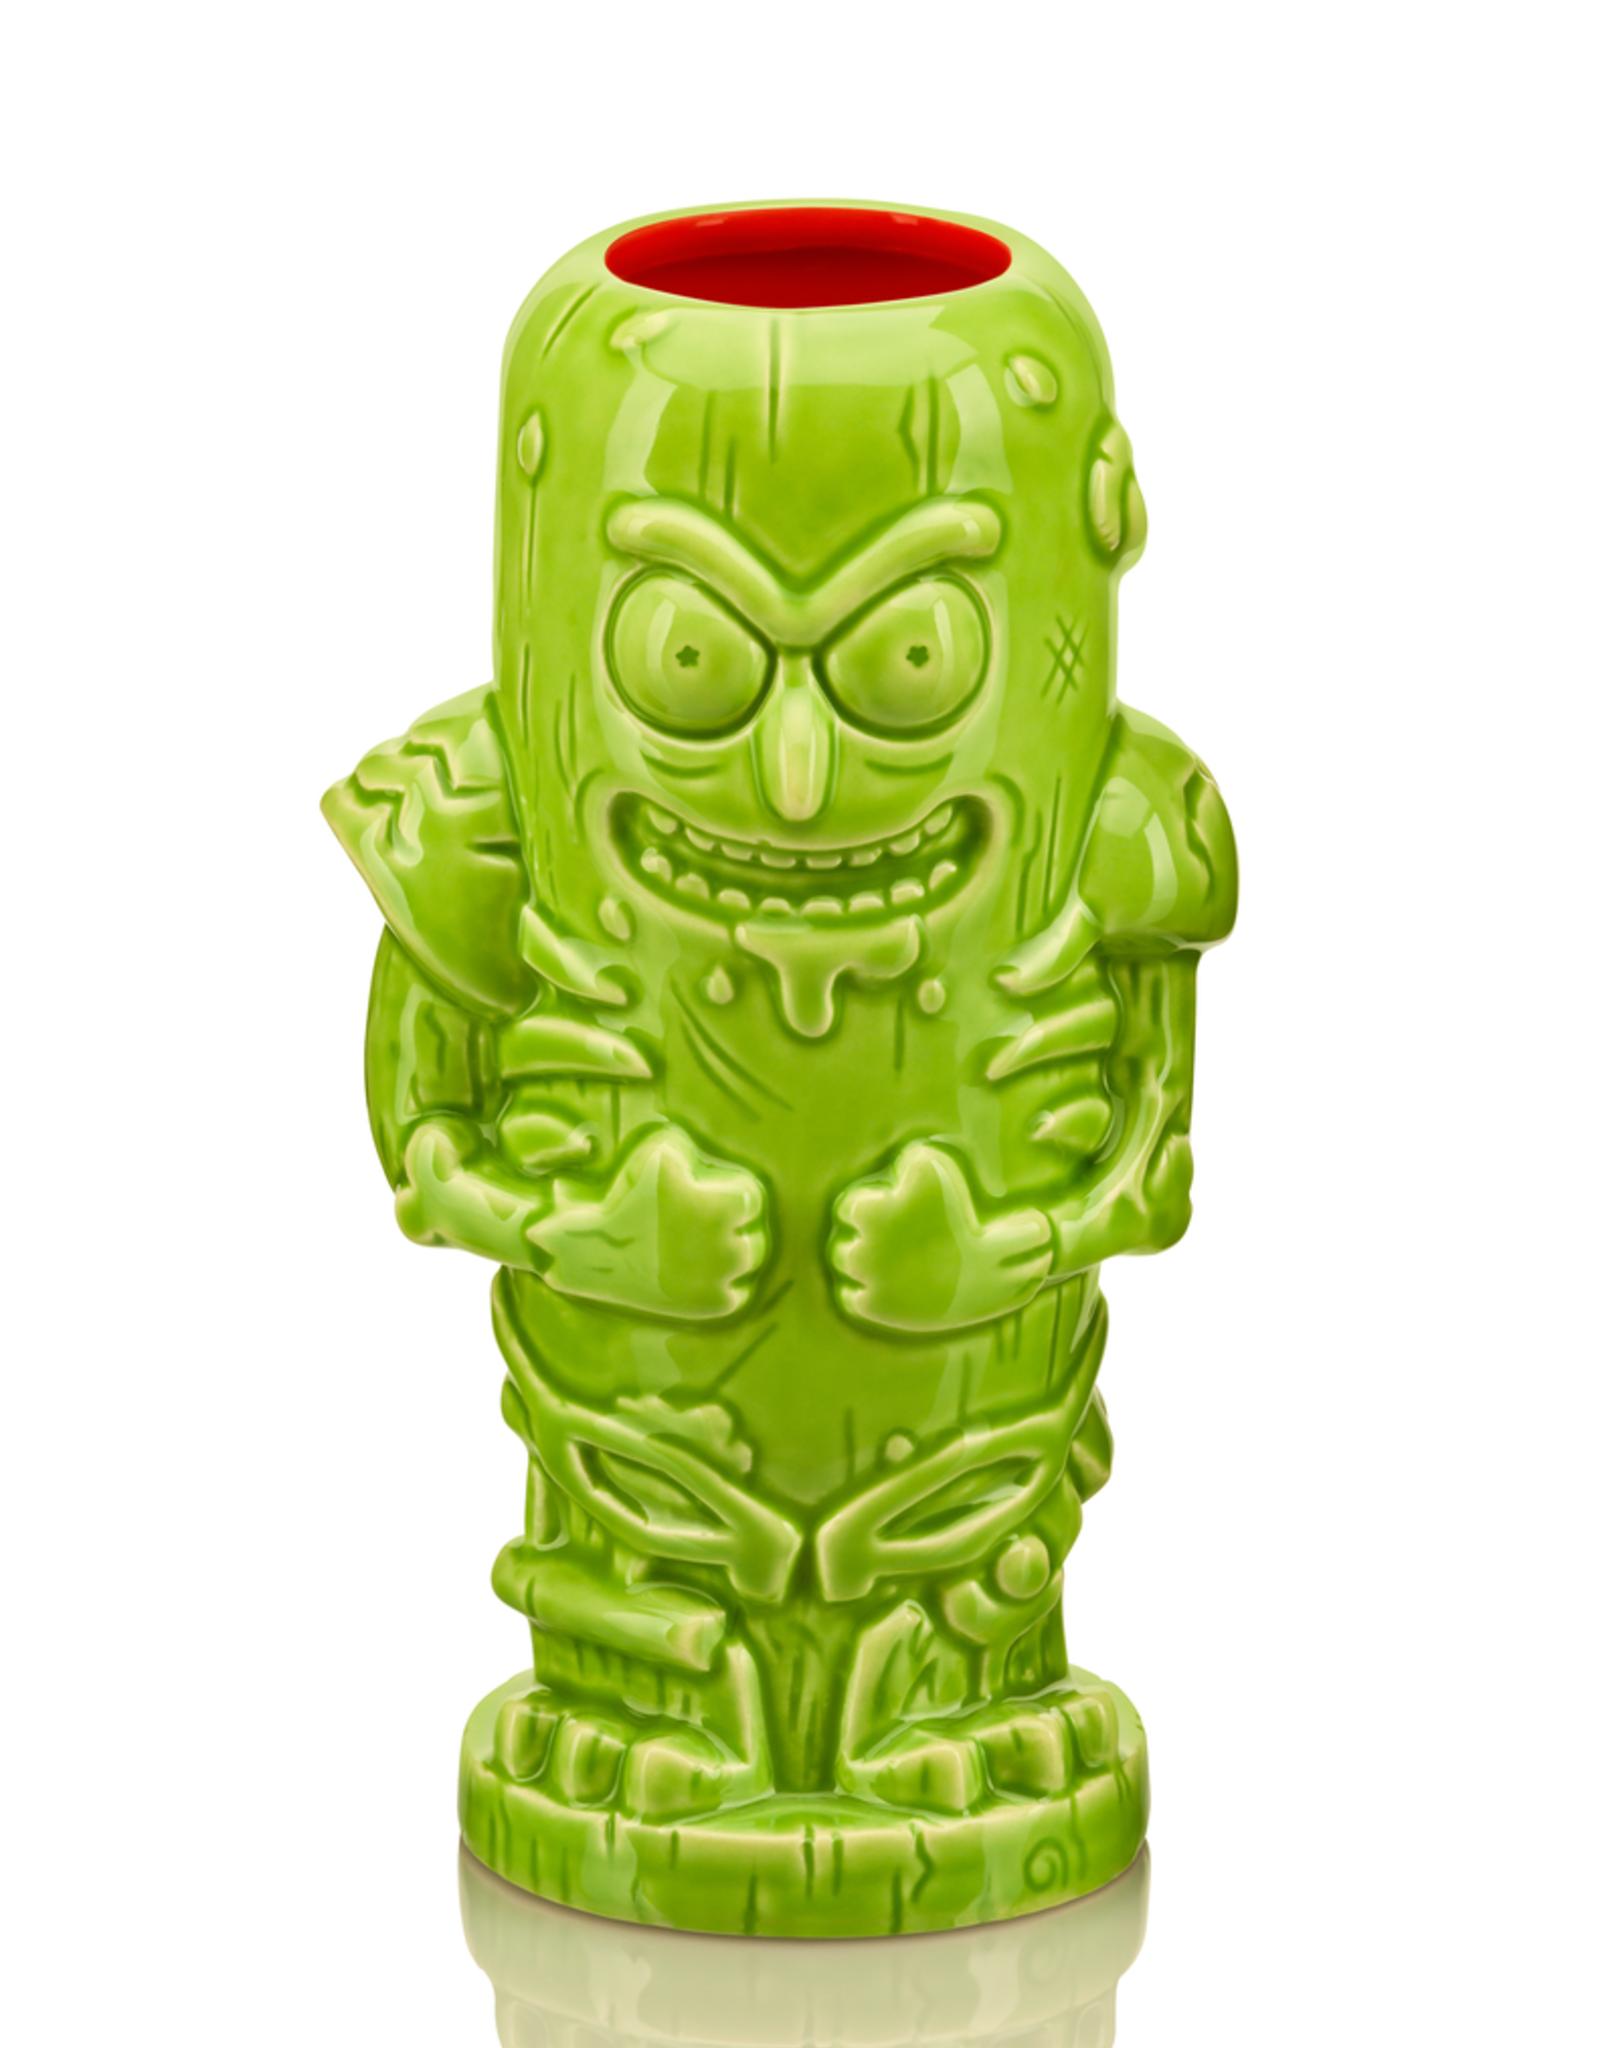 Geeki Tikis - Pickle Rick